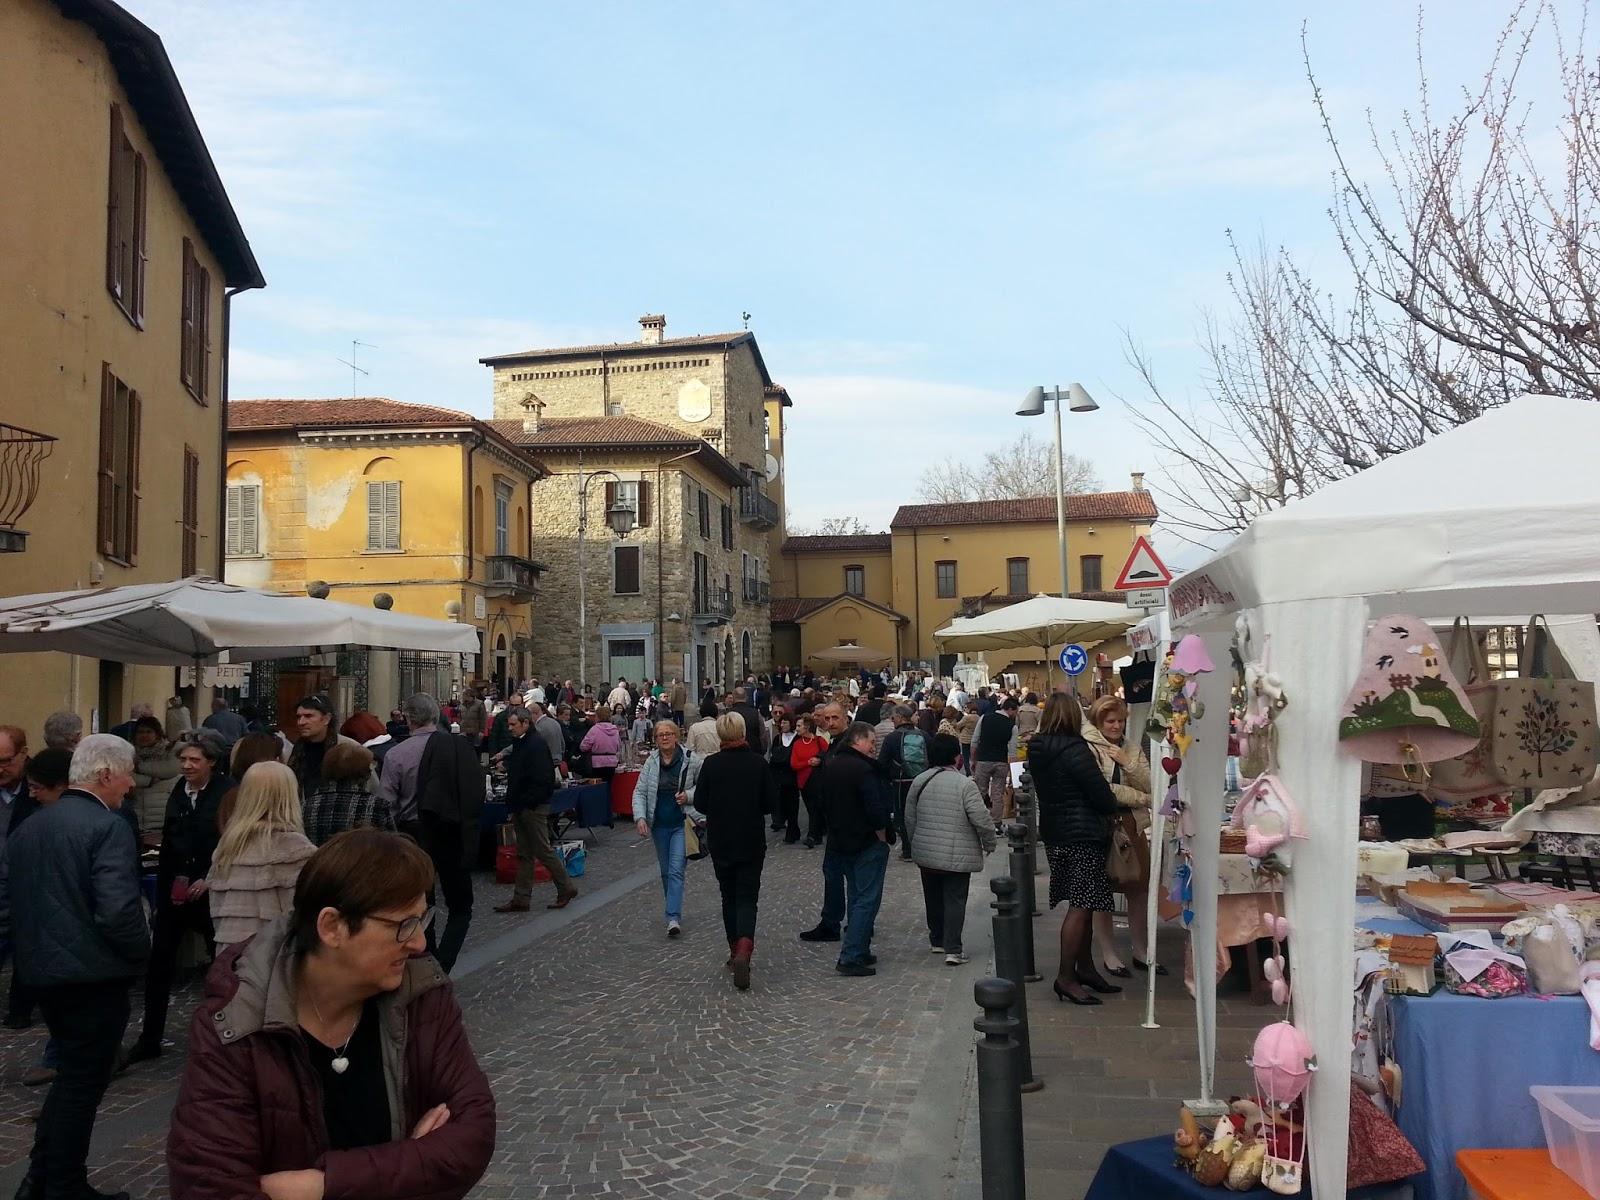 Artecarlacolombo mercatino dell 39 antico ad imbersago - Mercatino imbersago ...